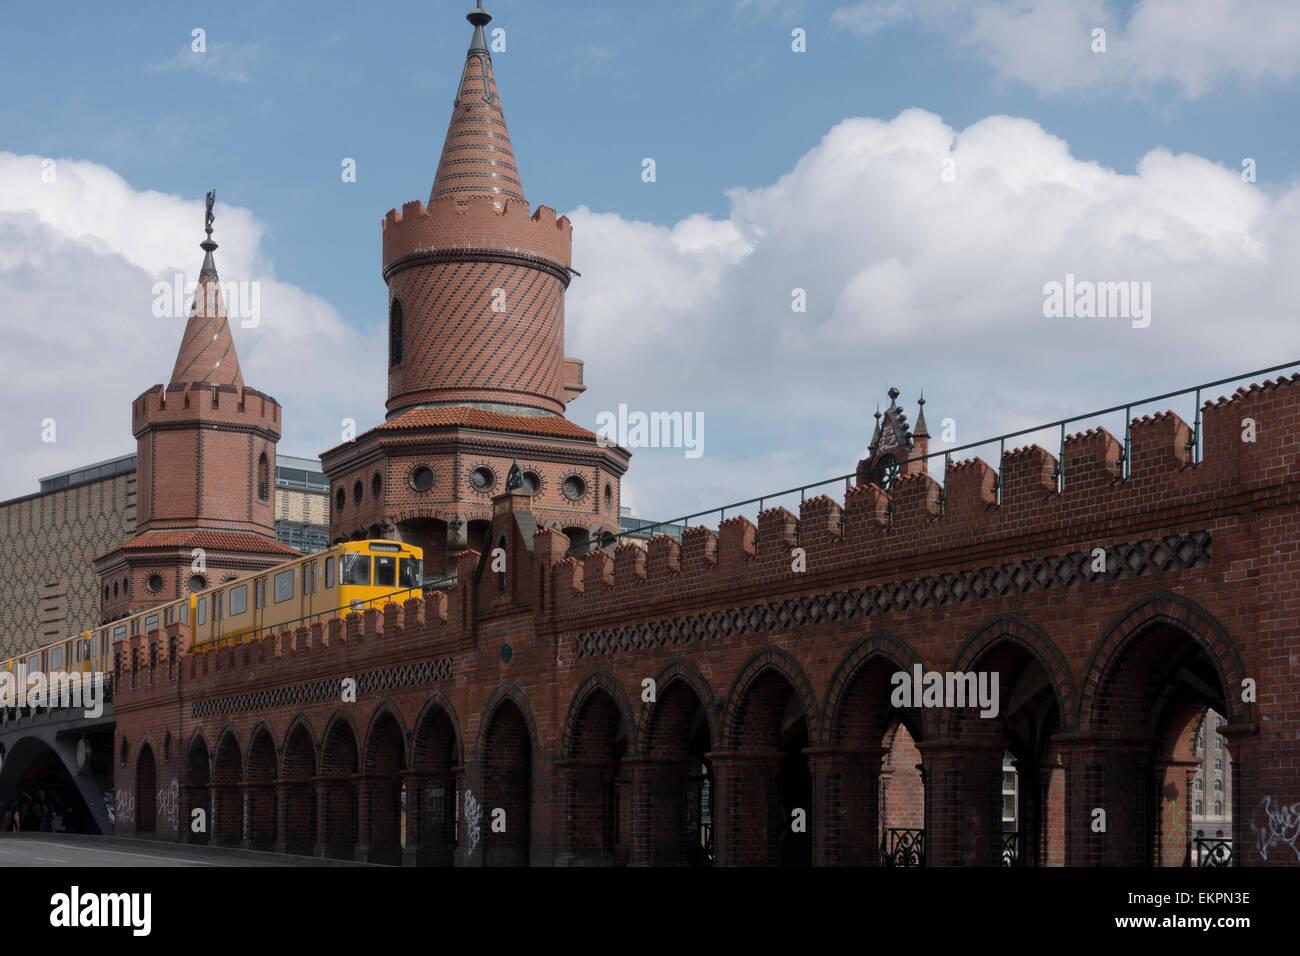 U1-U-Bahn-Zug der Oberbaumbrücke Brücke, Berlin, Deutschland -1 Stockbild